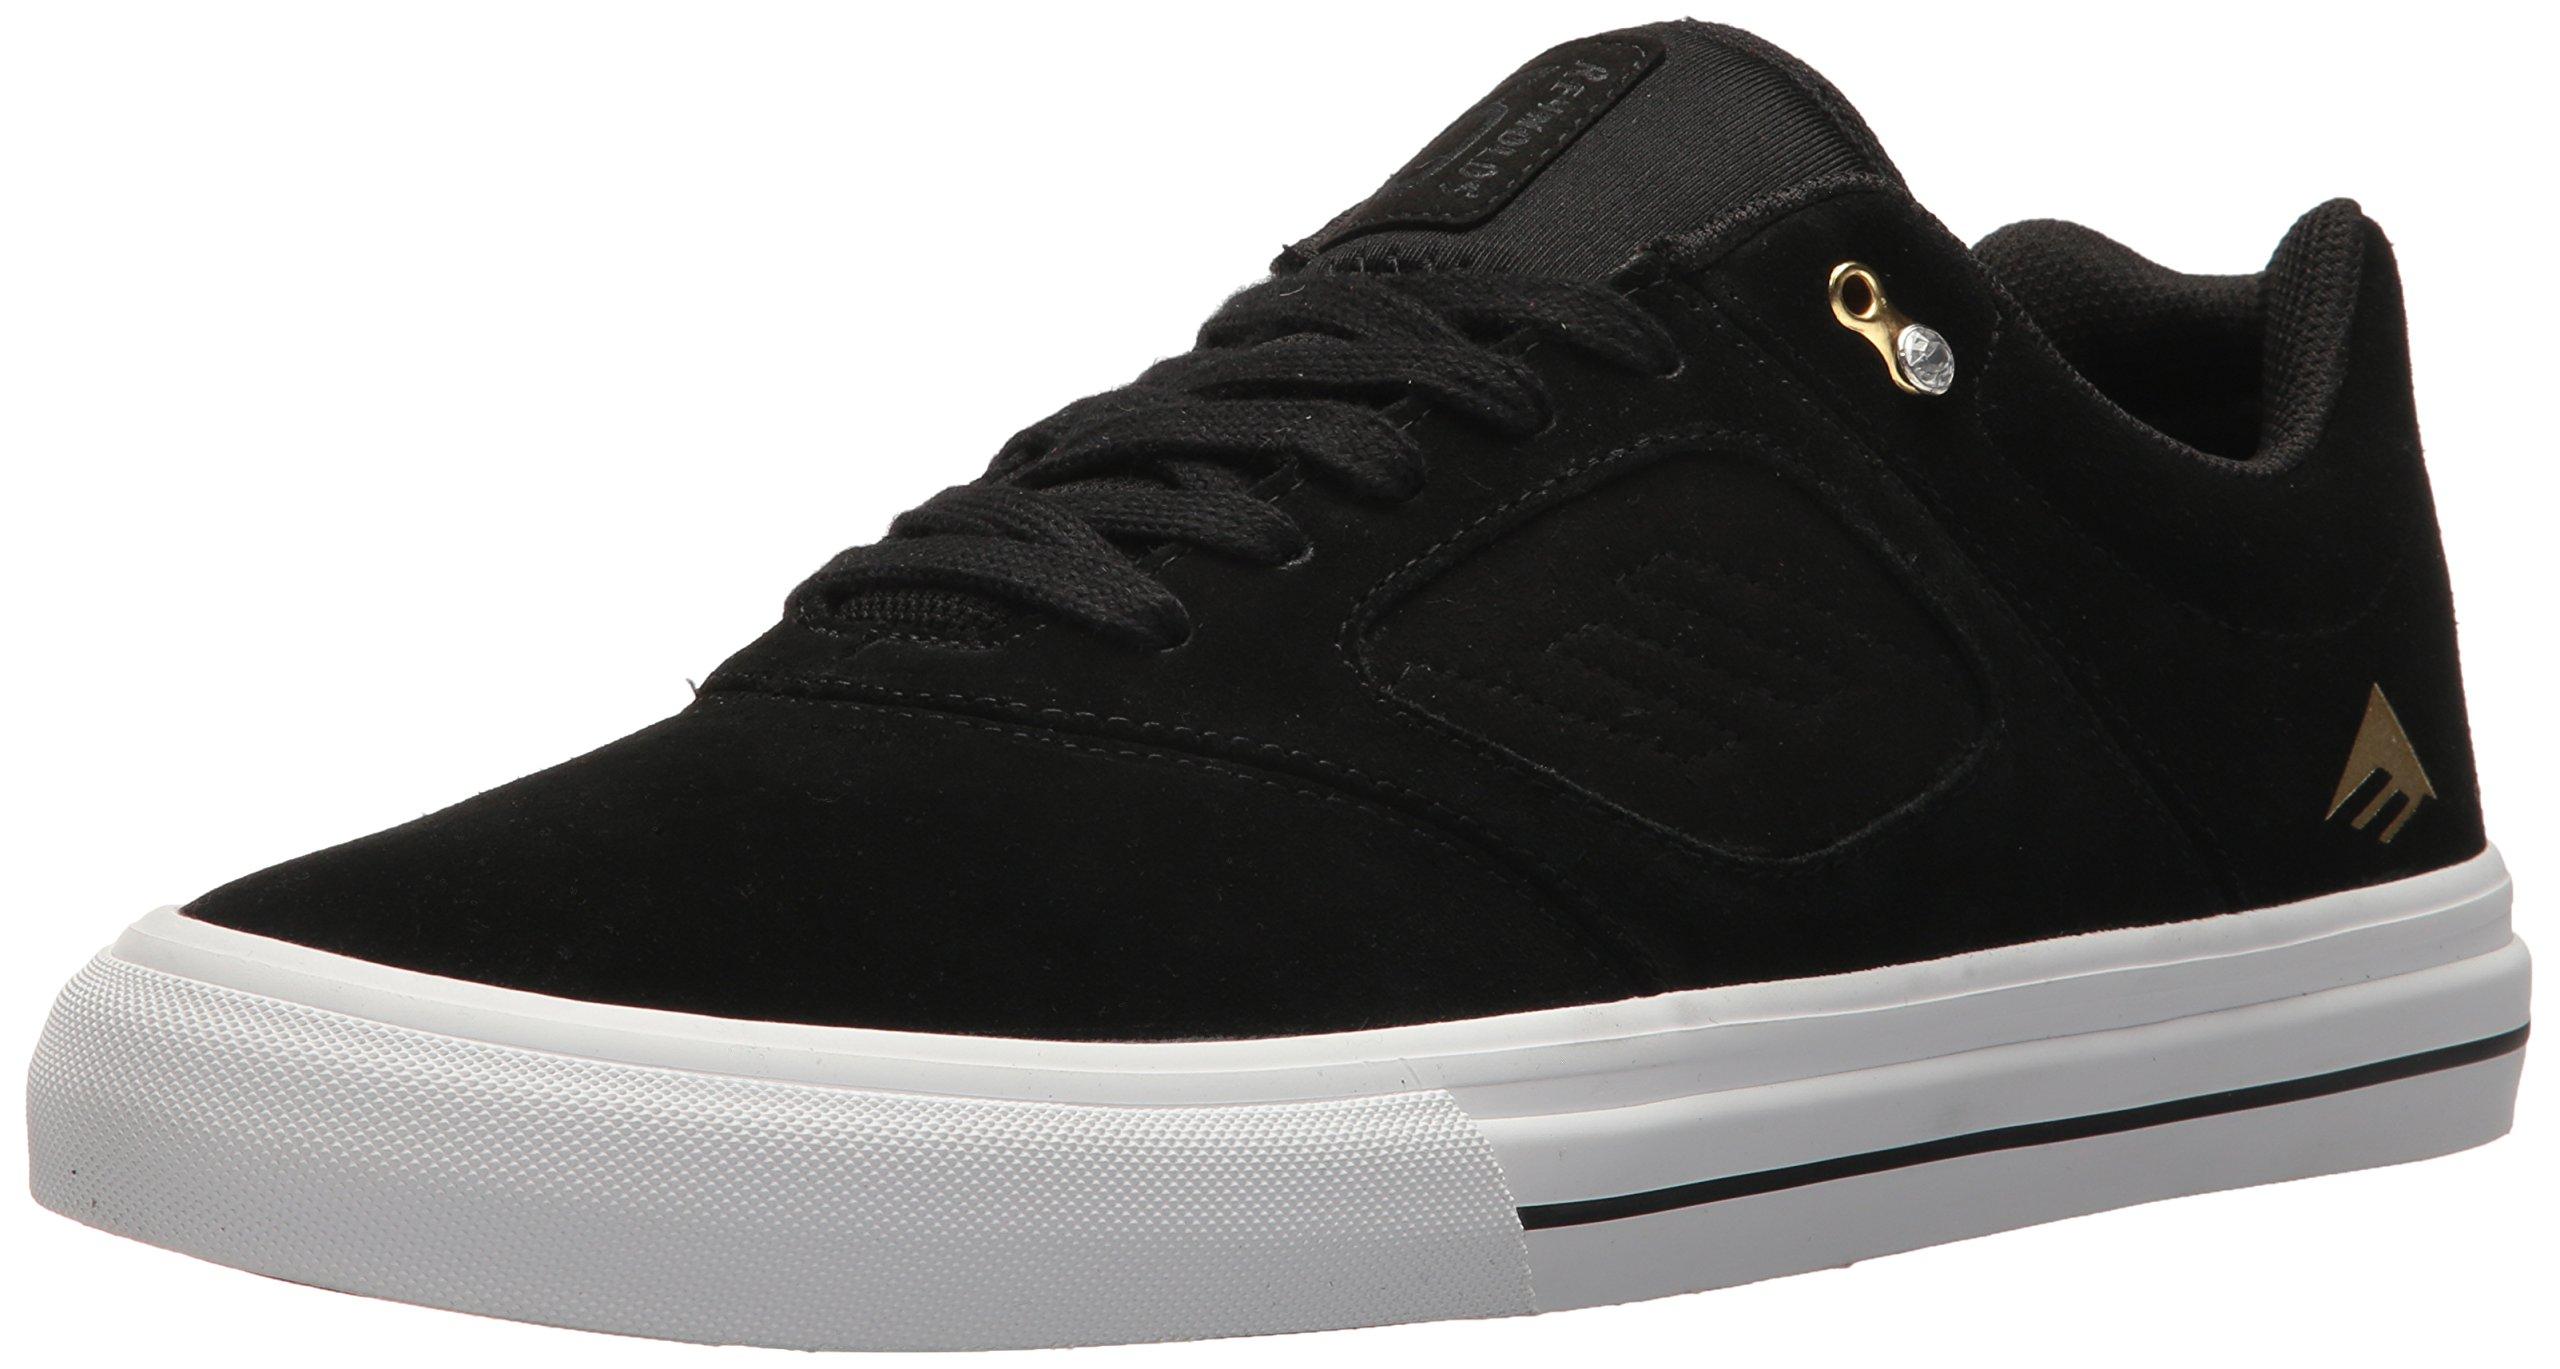 Emerica Reynolds Skate Black Medium